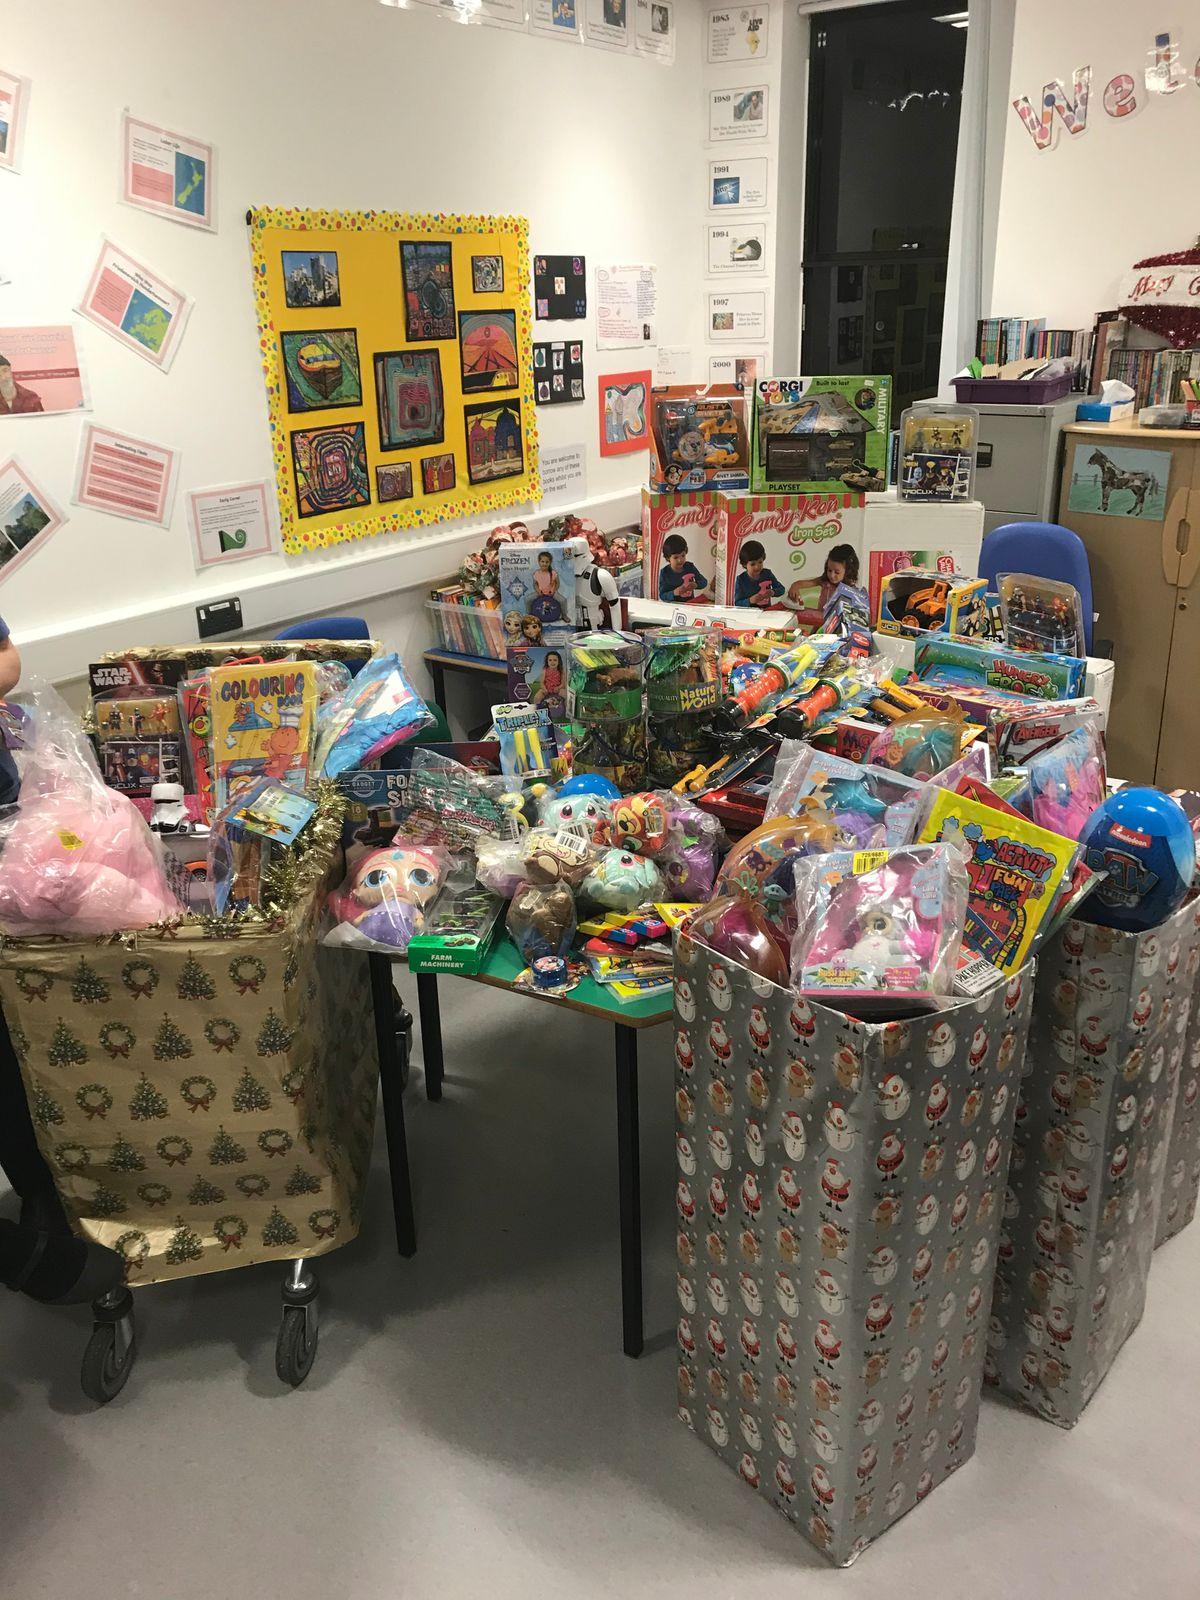 The toys donated to Princess Royal Hospital